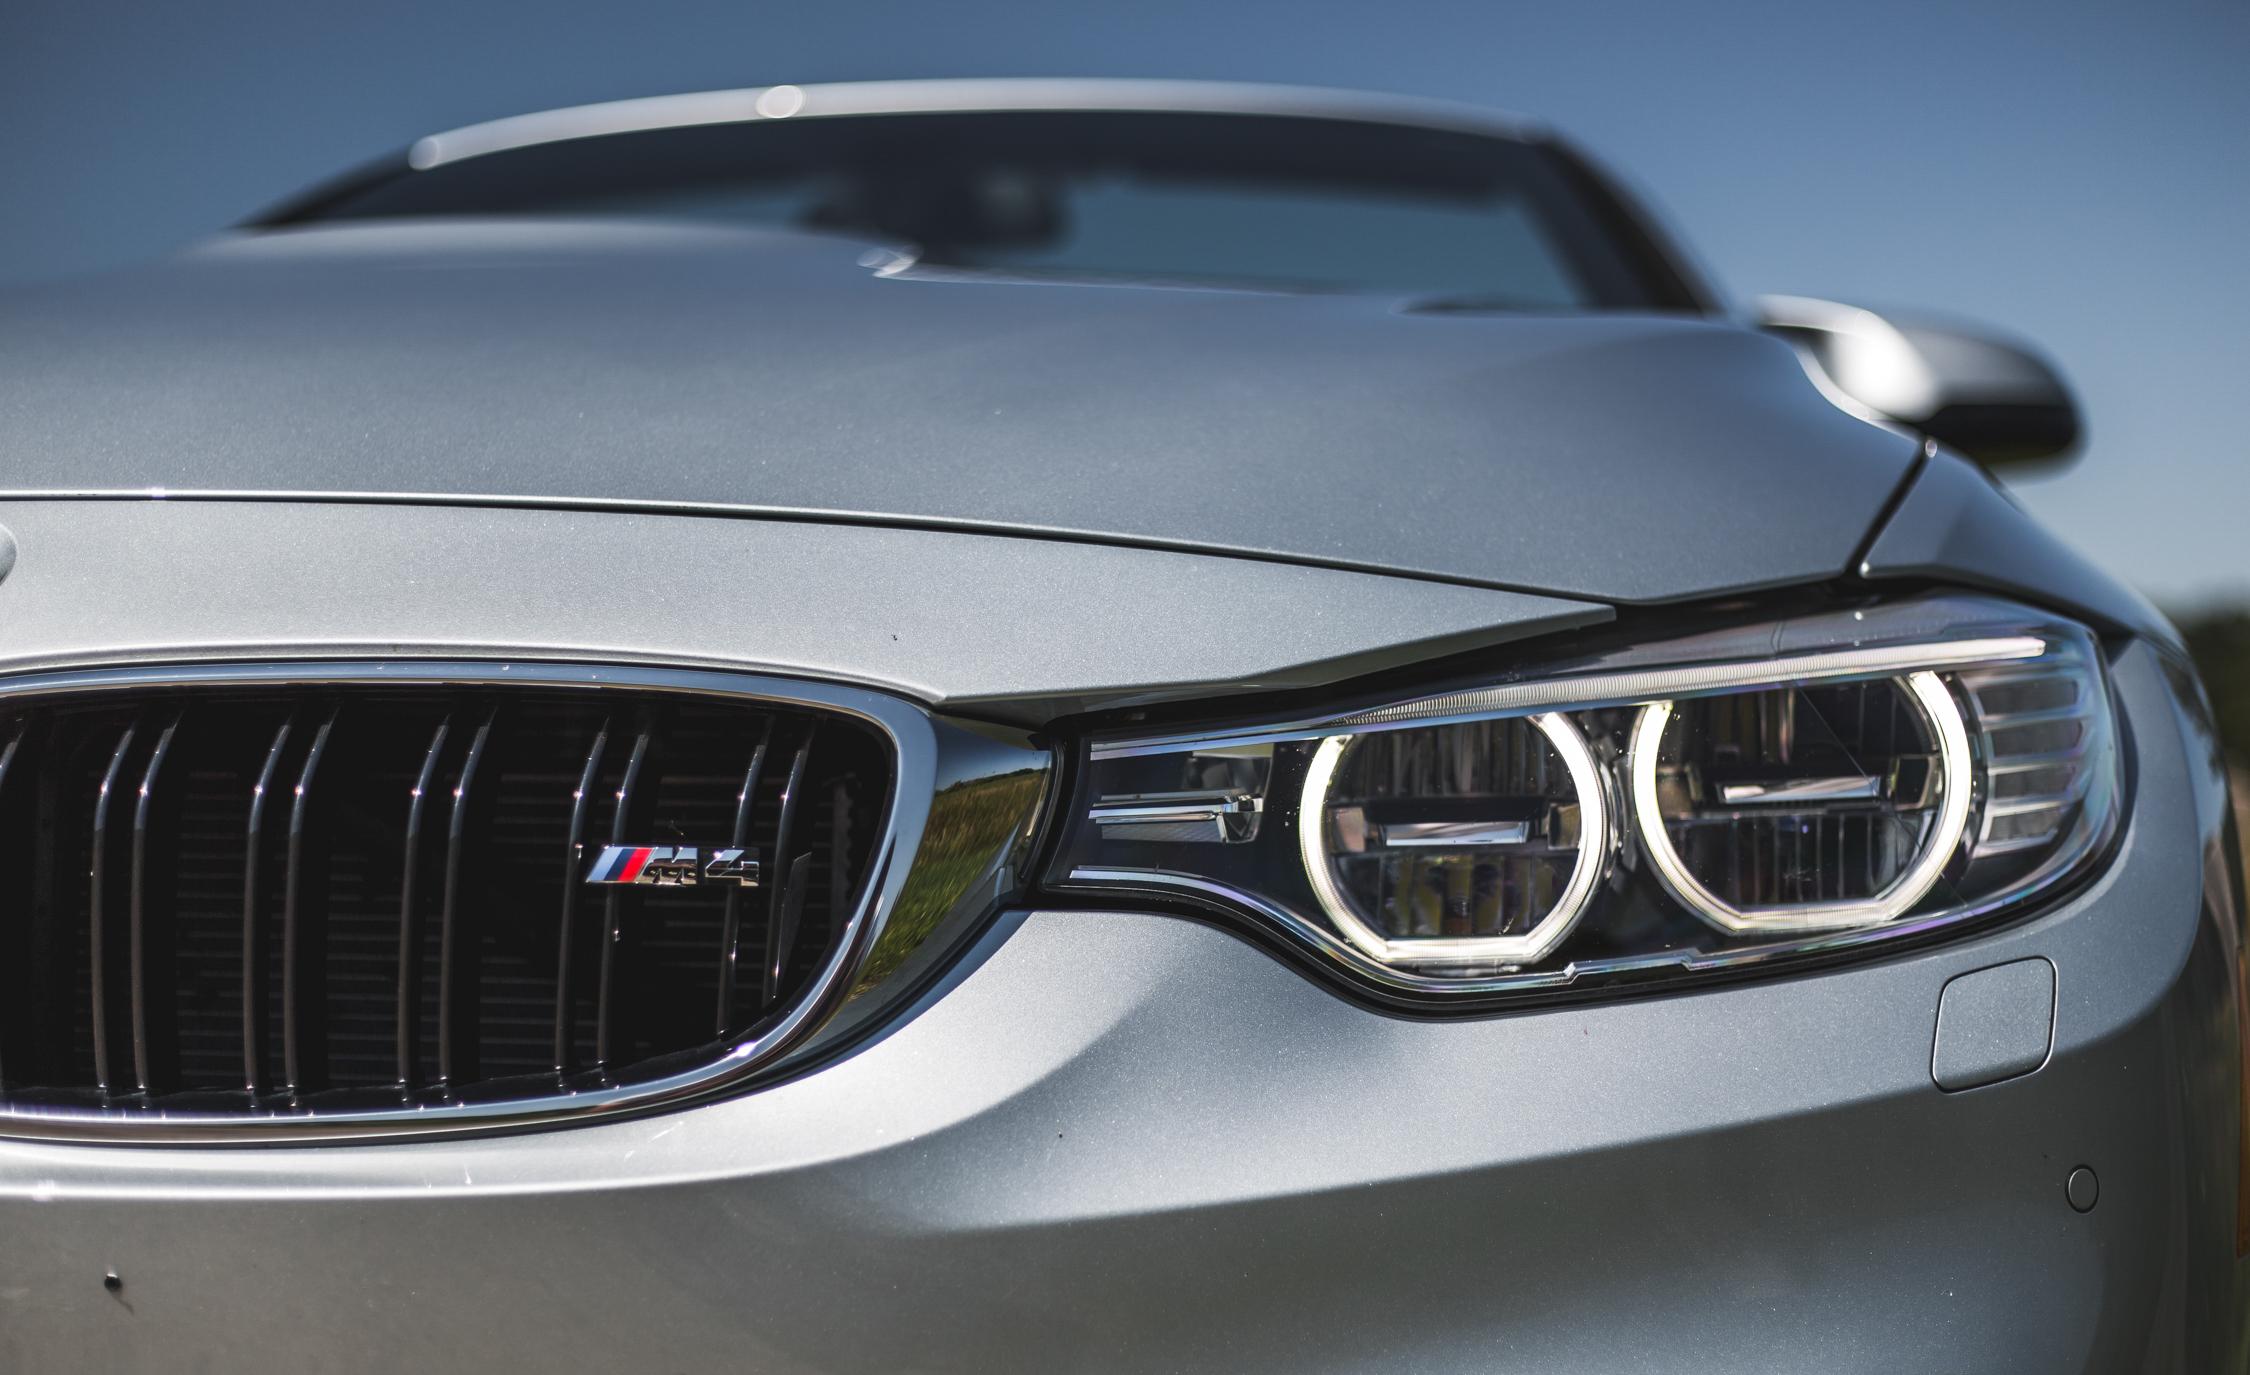 2015 BMW M4 Convertible Exterior Headlight